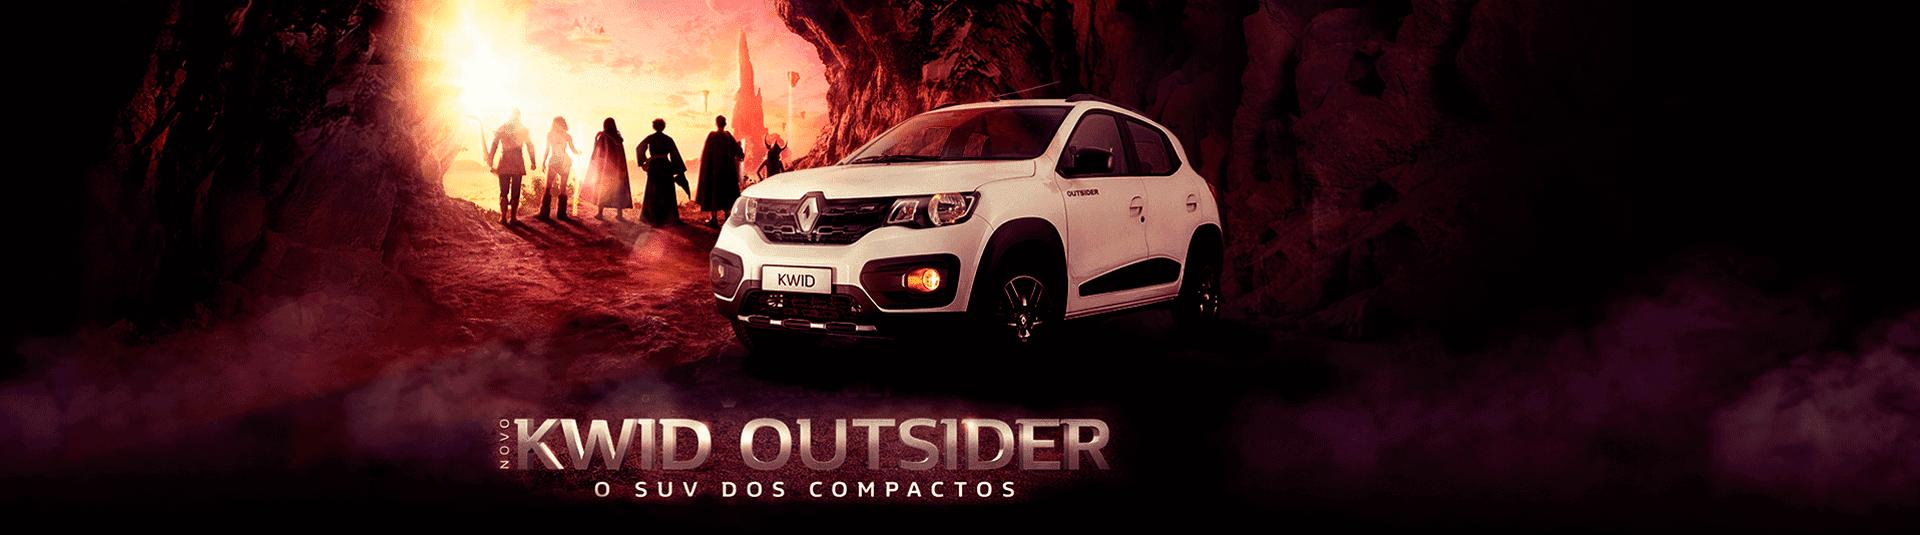 banner-home-kwid-outsider